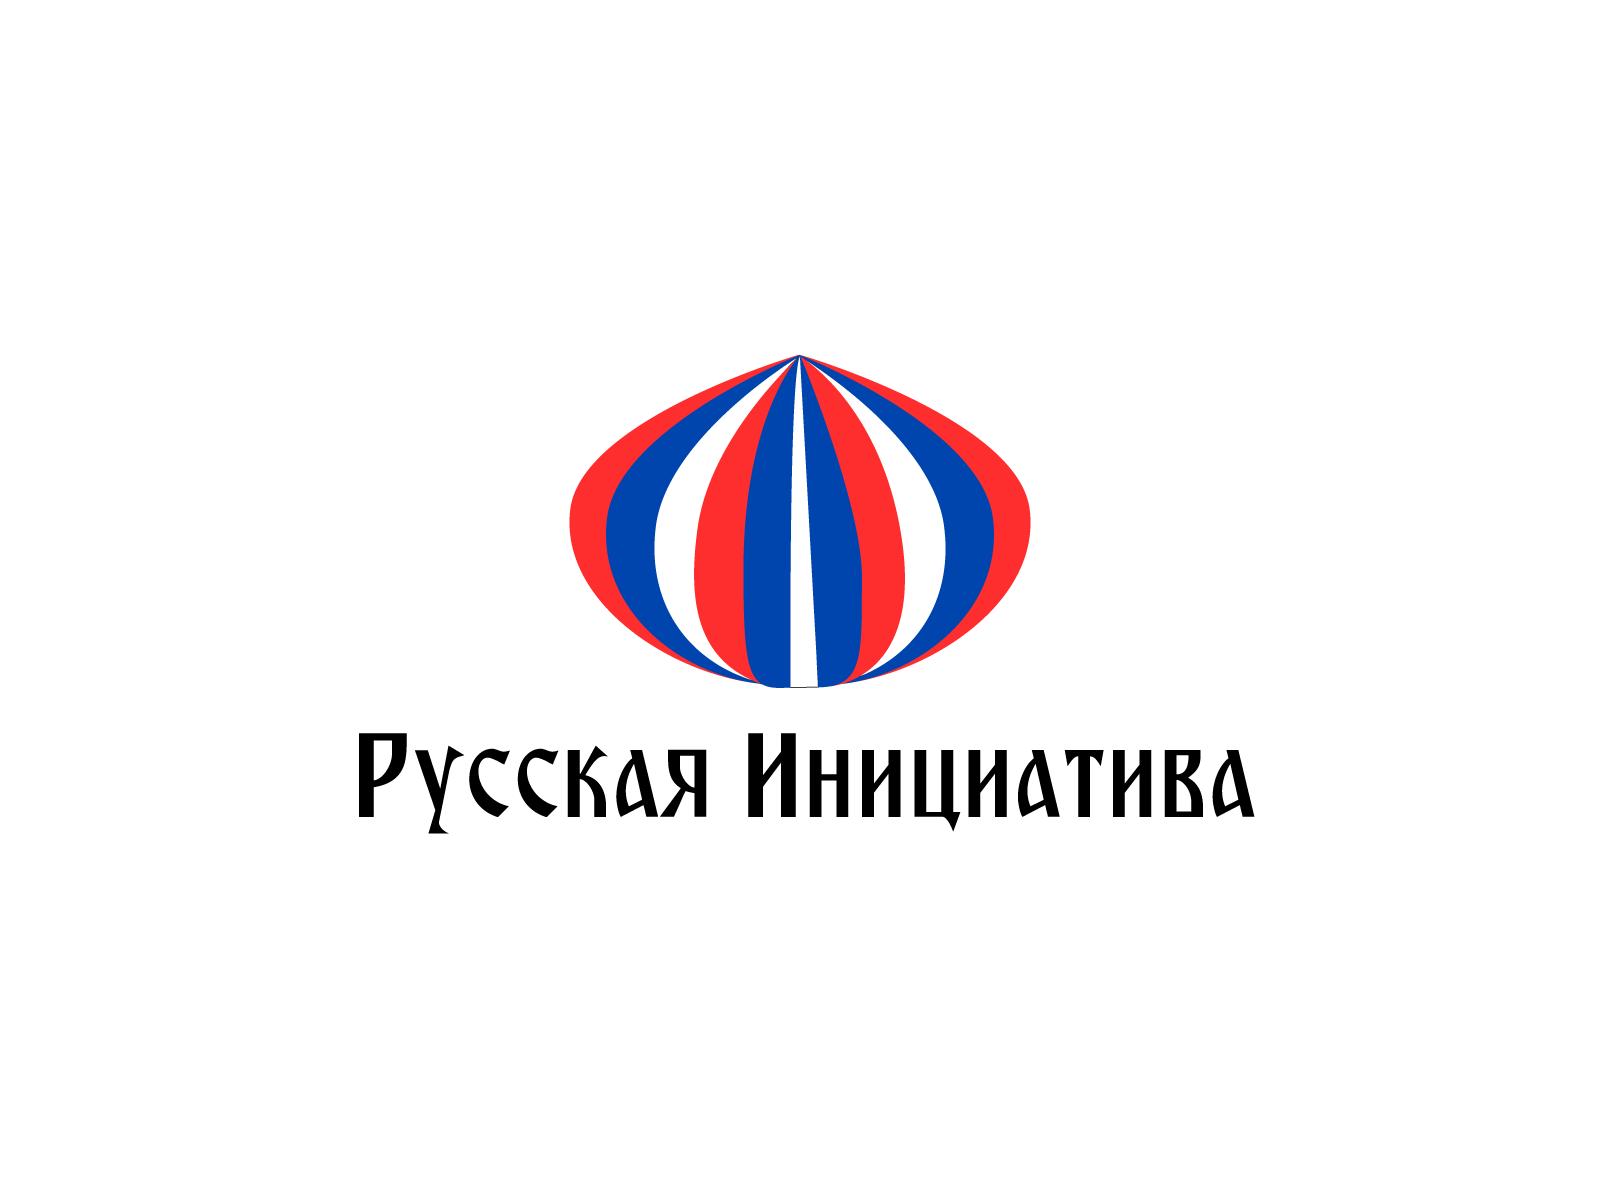 Разработать логотип для организации фото f_9255ec4d1f9aaf54.png